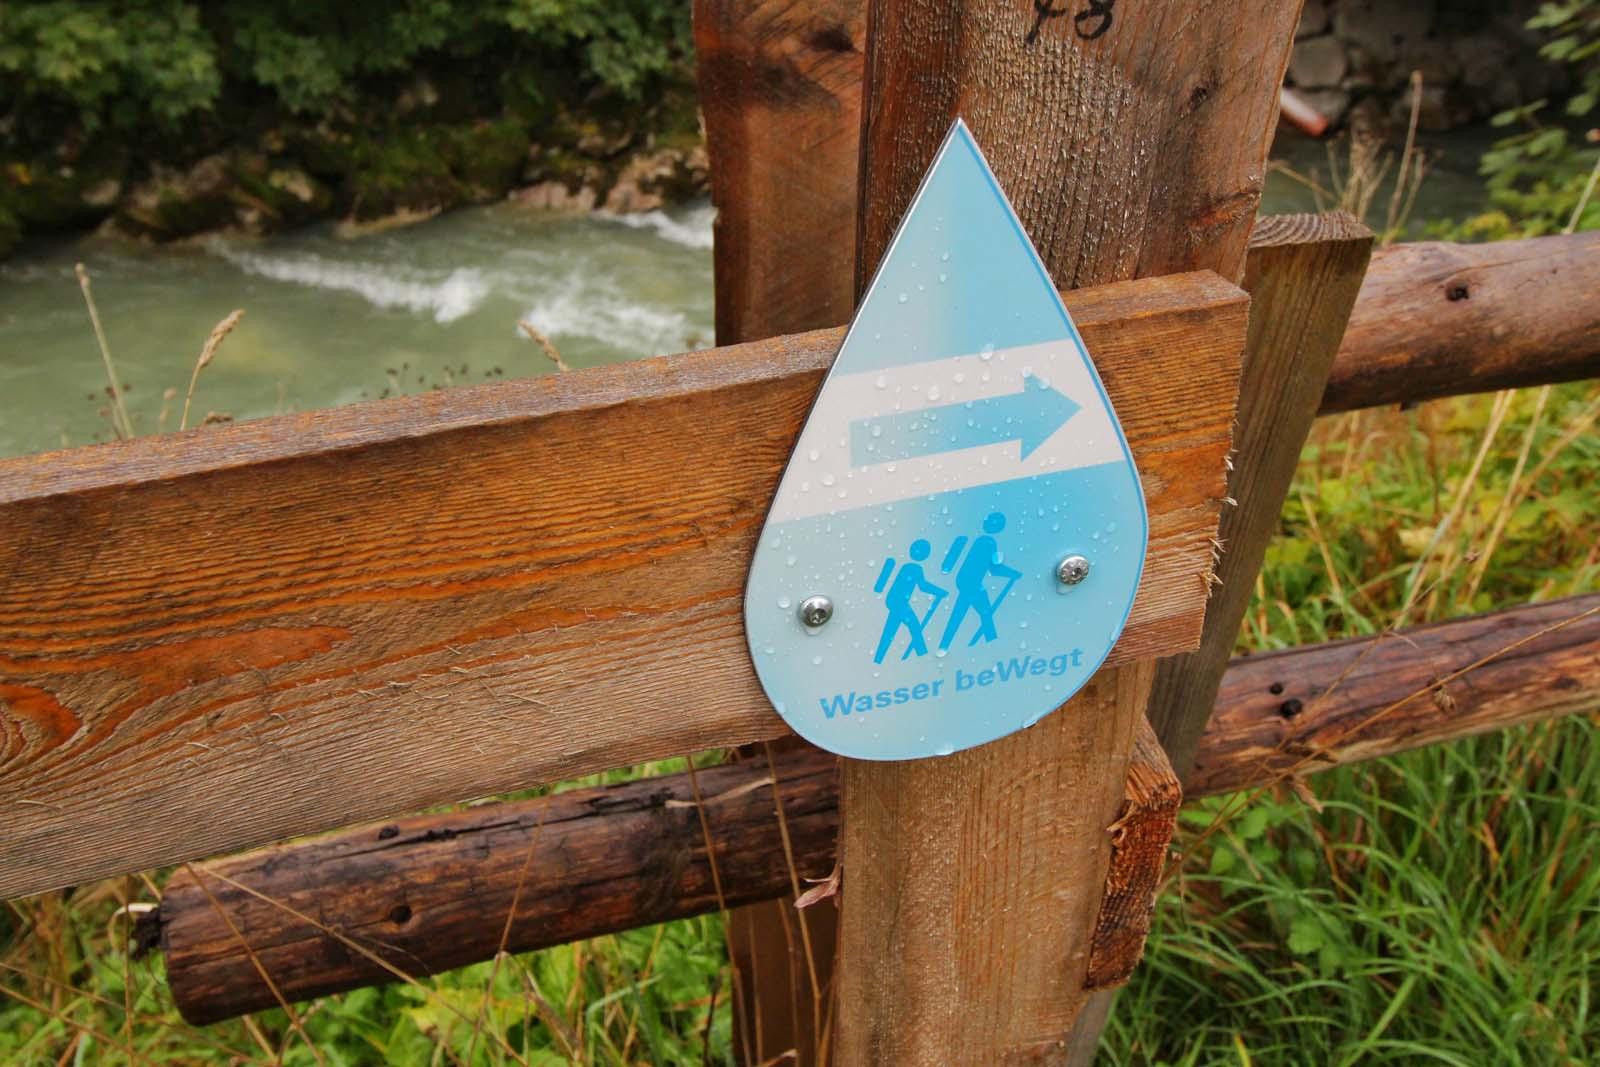 Wegmarkierung in Flachau